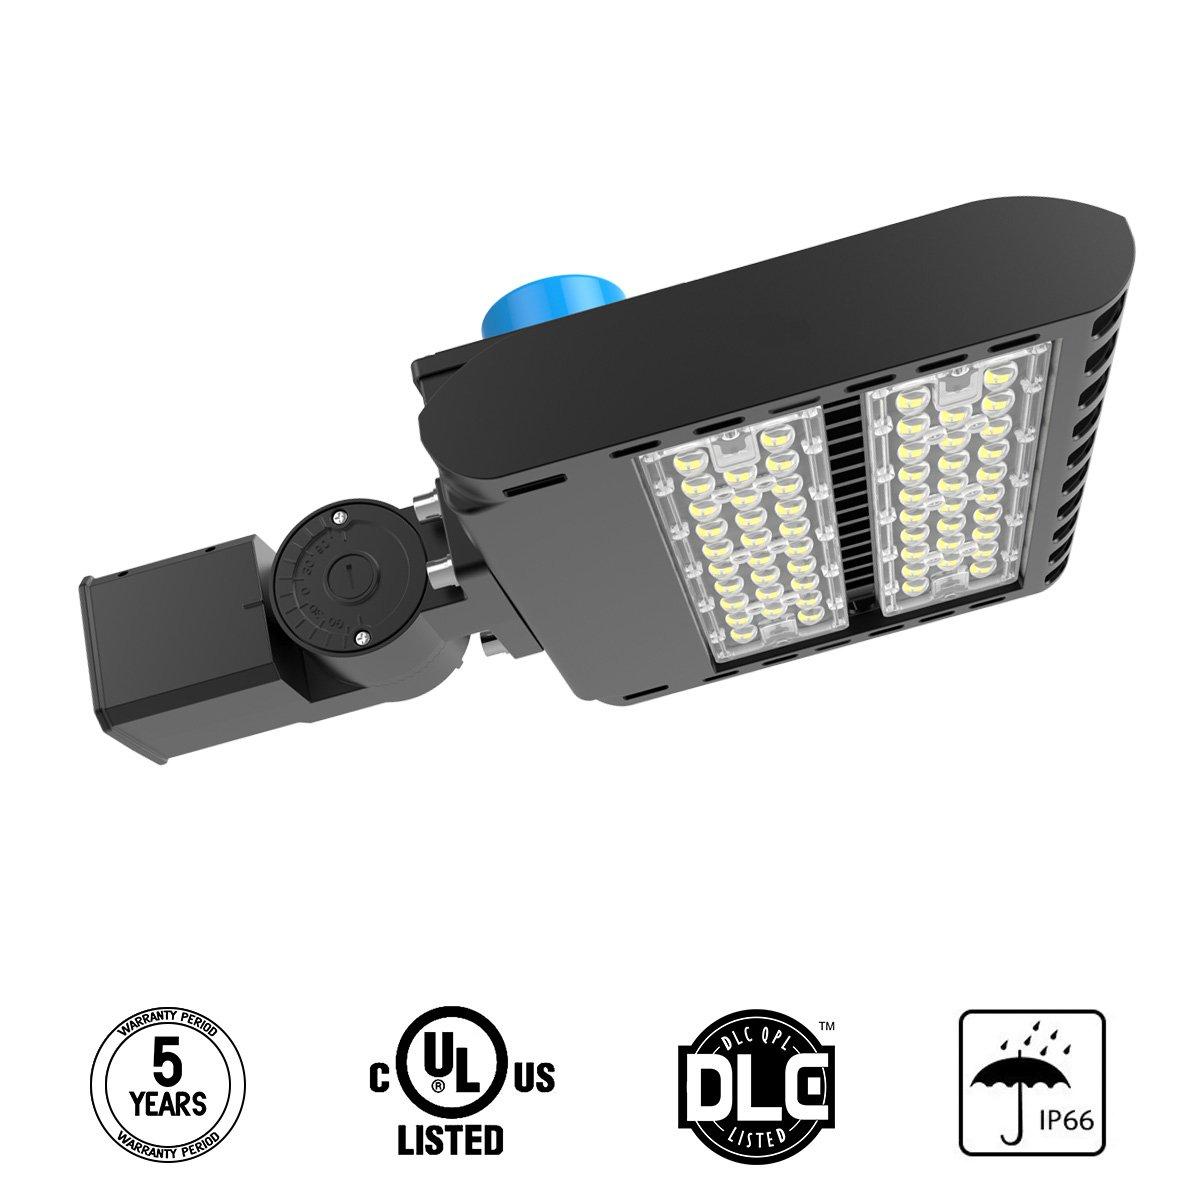 Adiding LED Parking Lot Light 3-Type Mounts 150W Street Area Light Lumileds SMD 3030 LED 130 Lm/W Daylight 5700K Bright White Light with Photocell Sensor&Shorting Circuit Cap IP66 UL DLC Listed